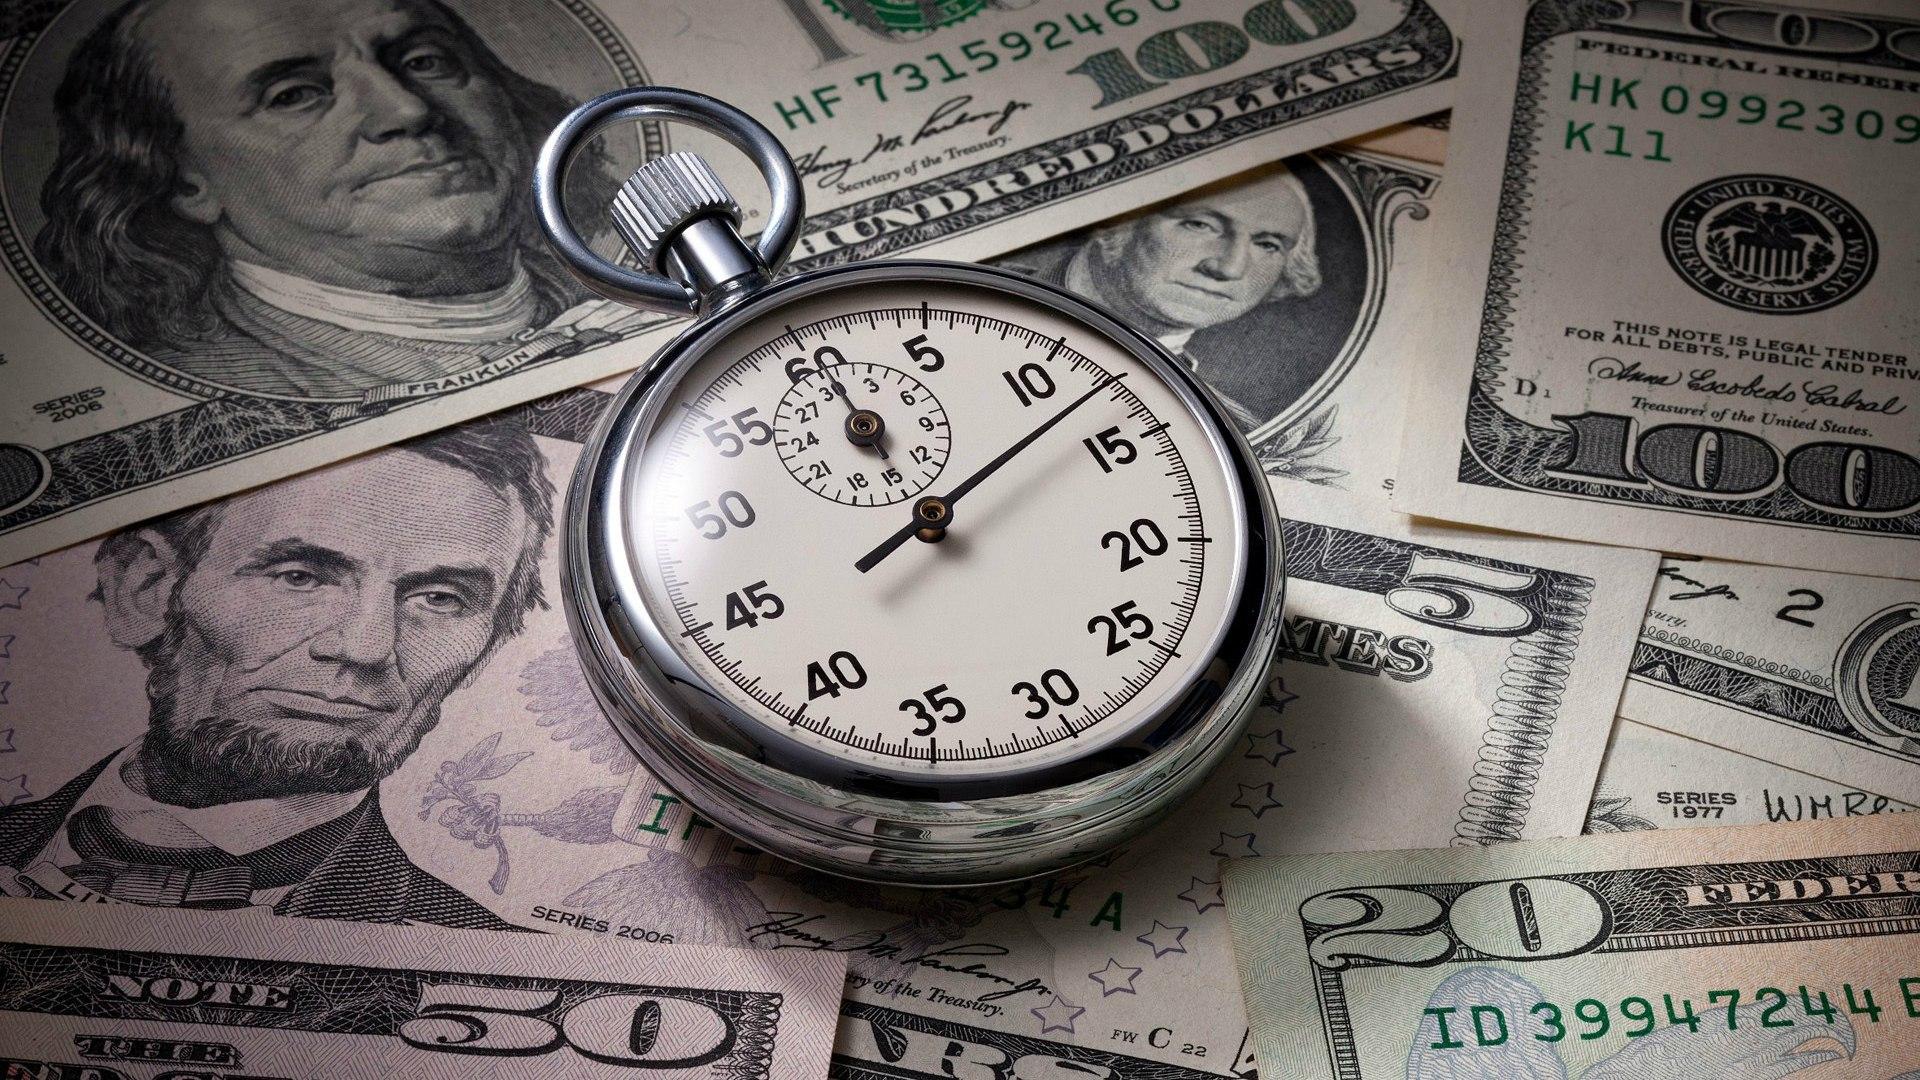 _Time_-_is_money_095207_.jpg